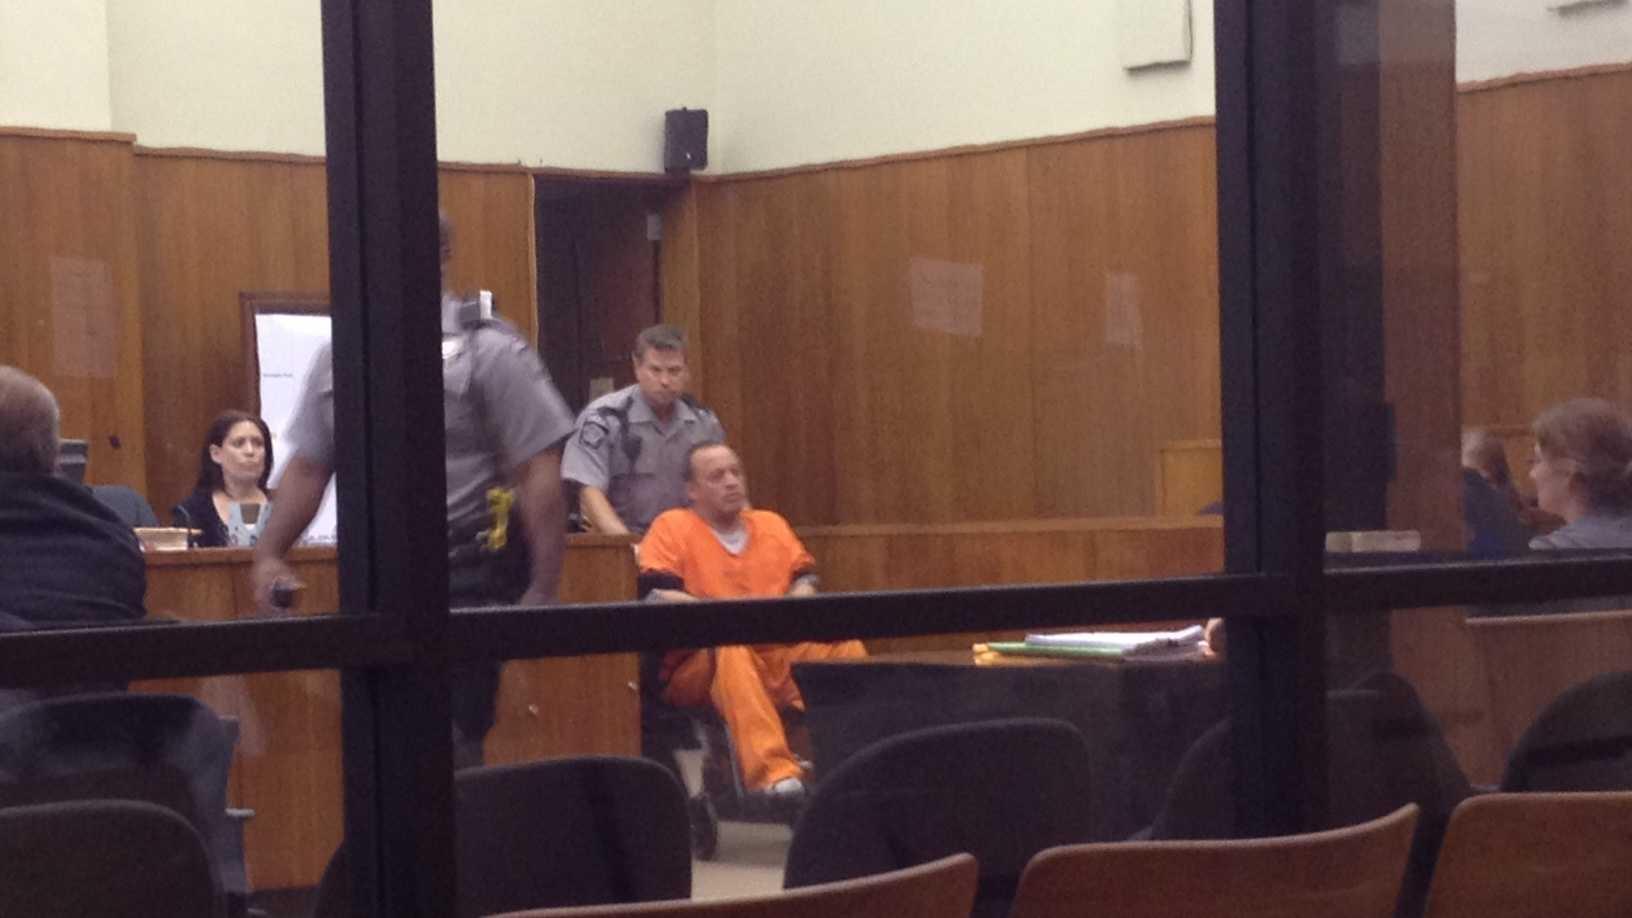 Hutchins in court